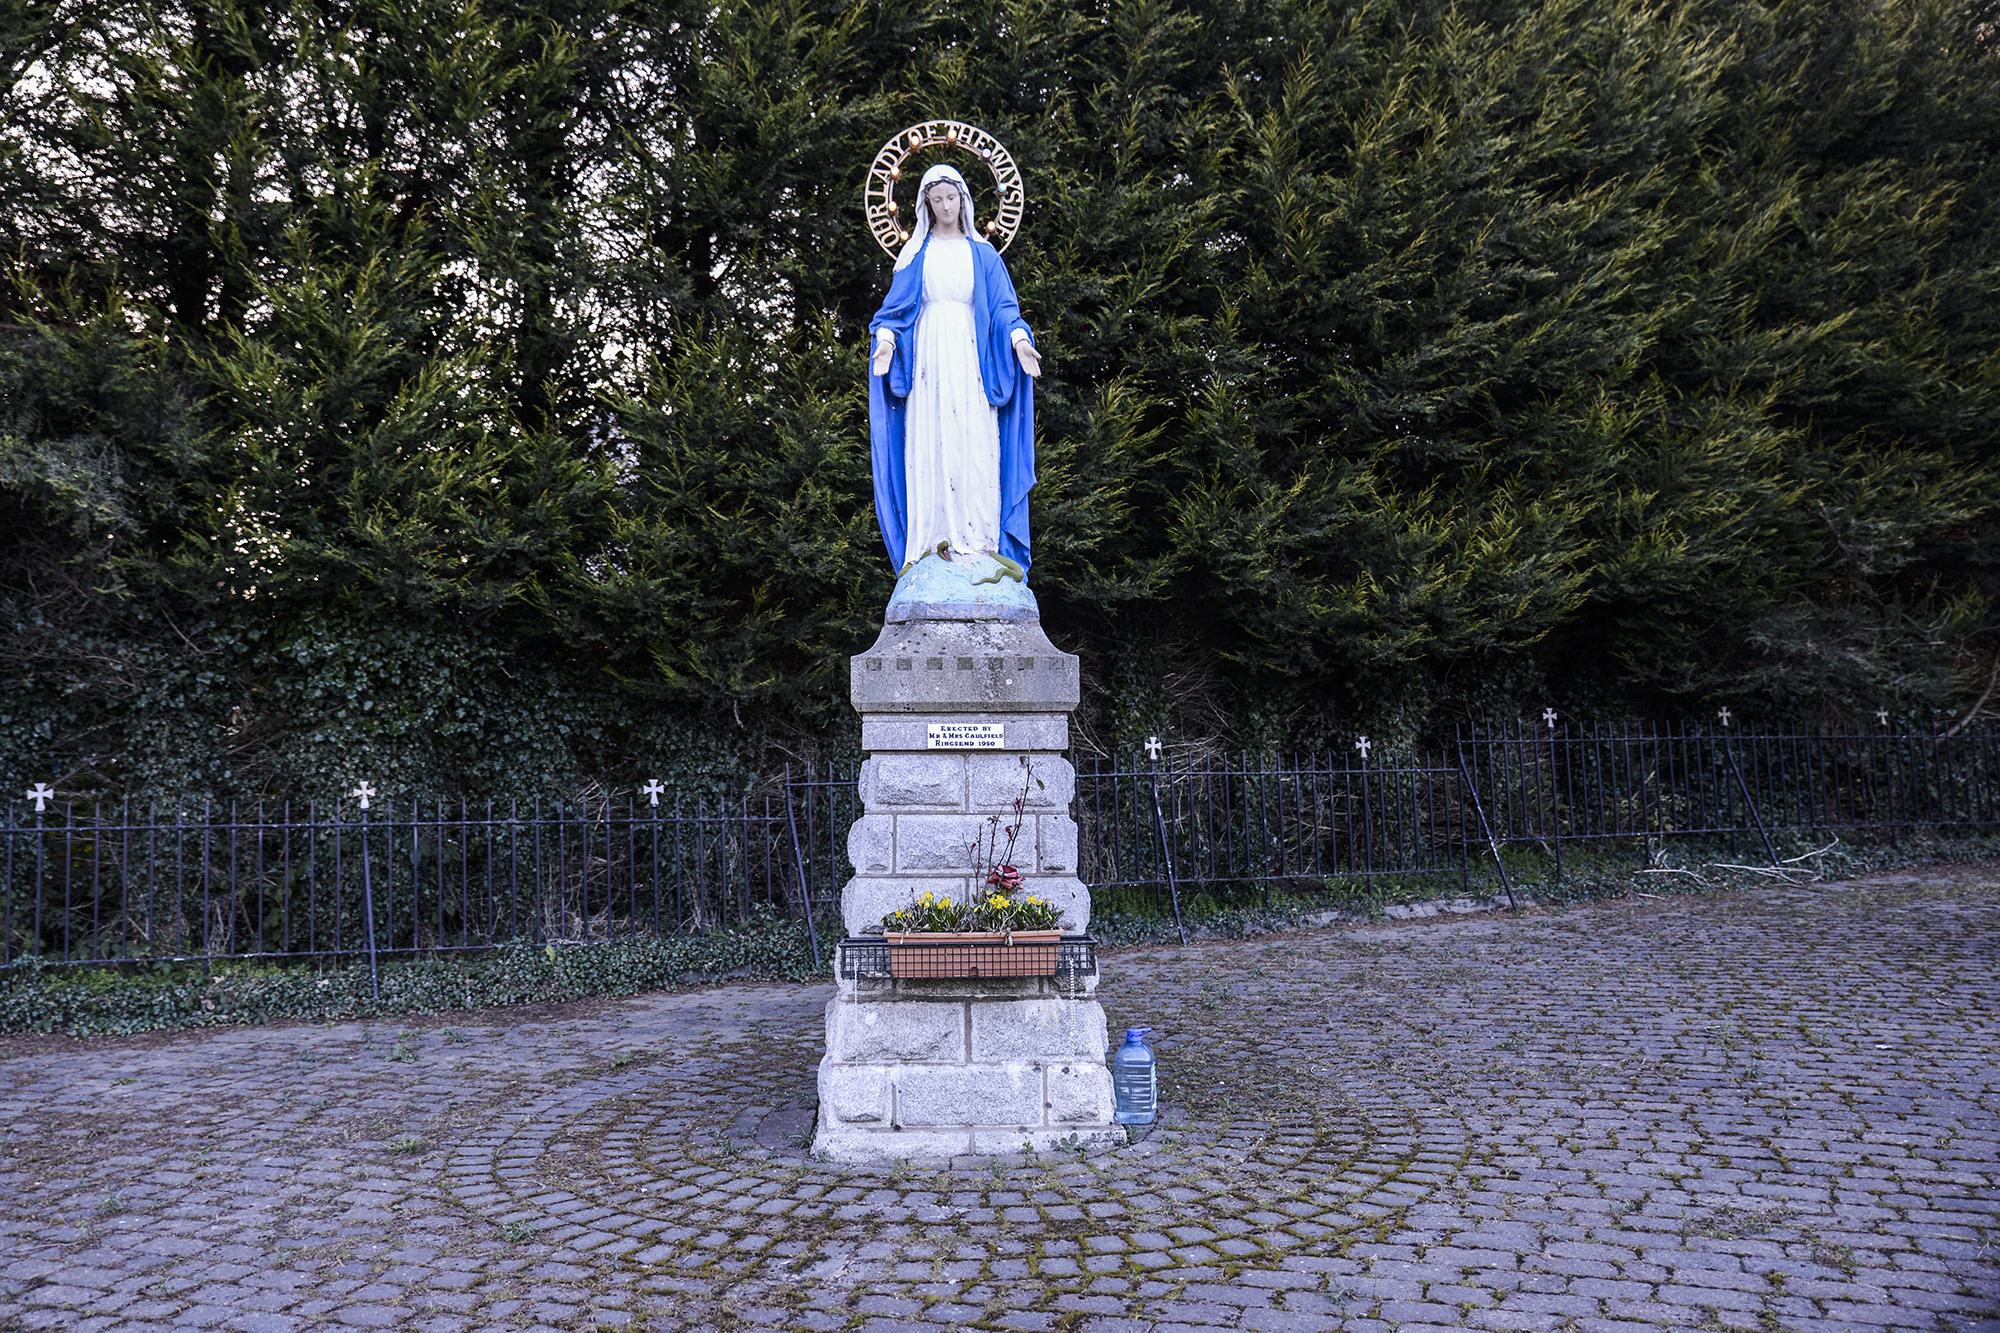 Carlow Mary